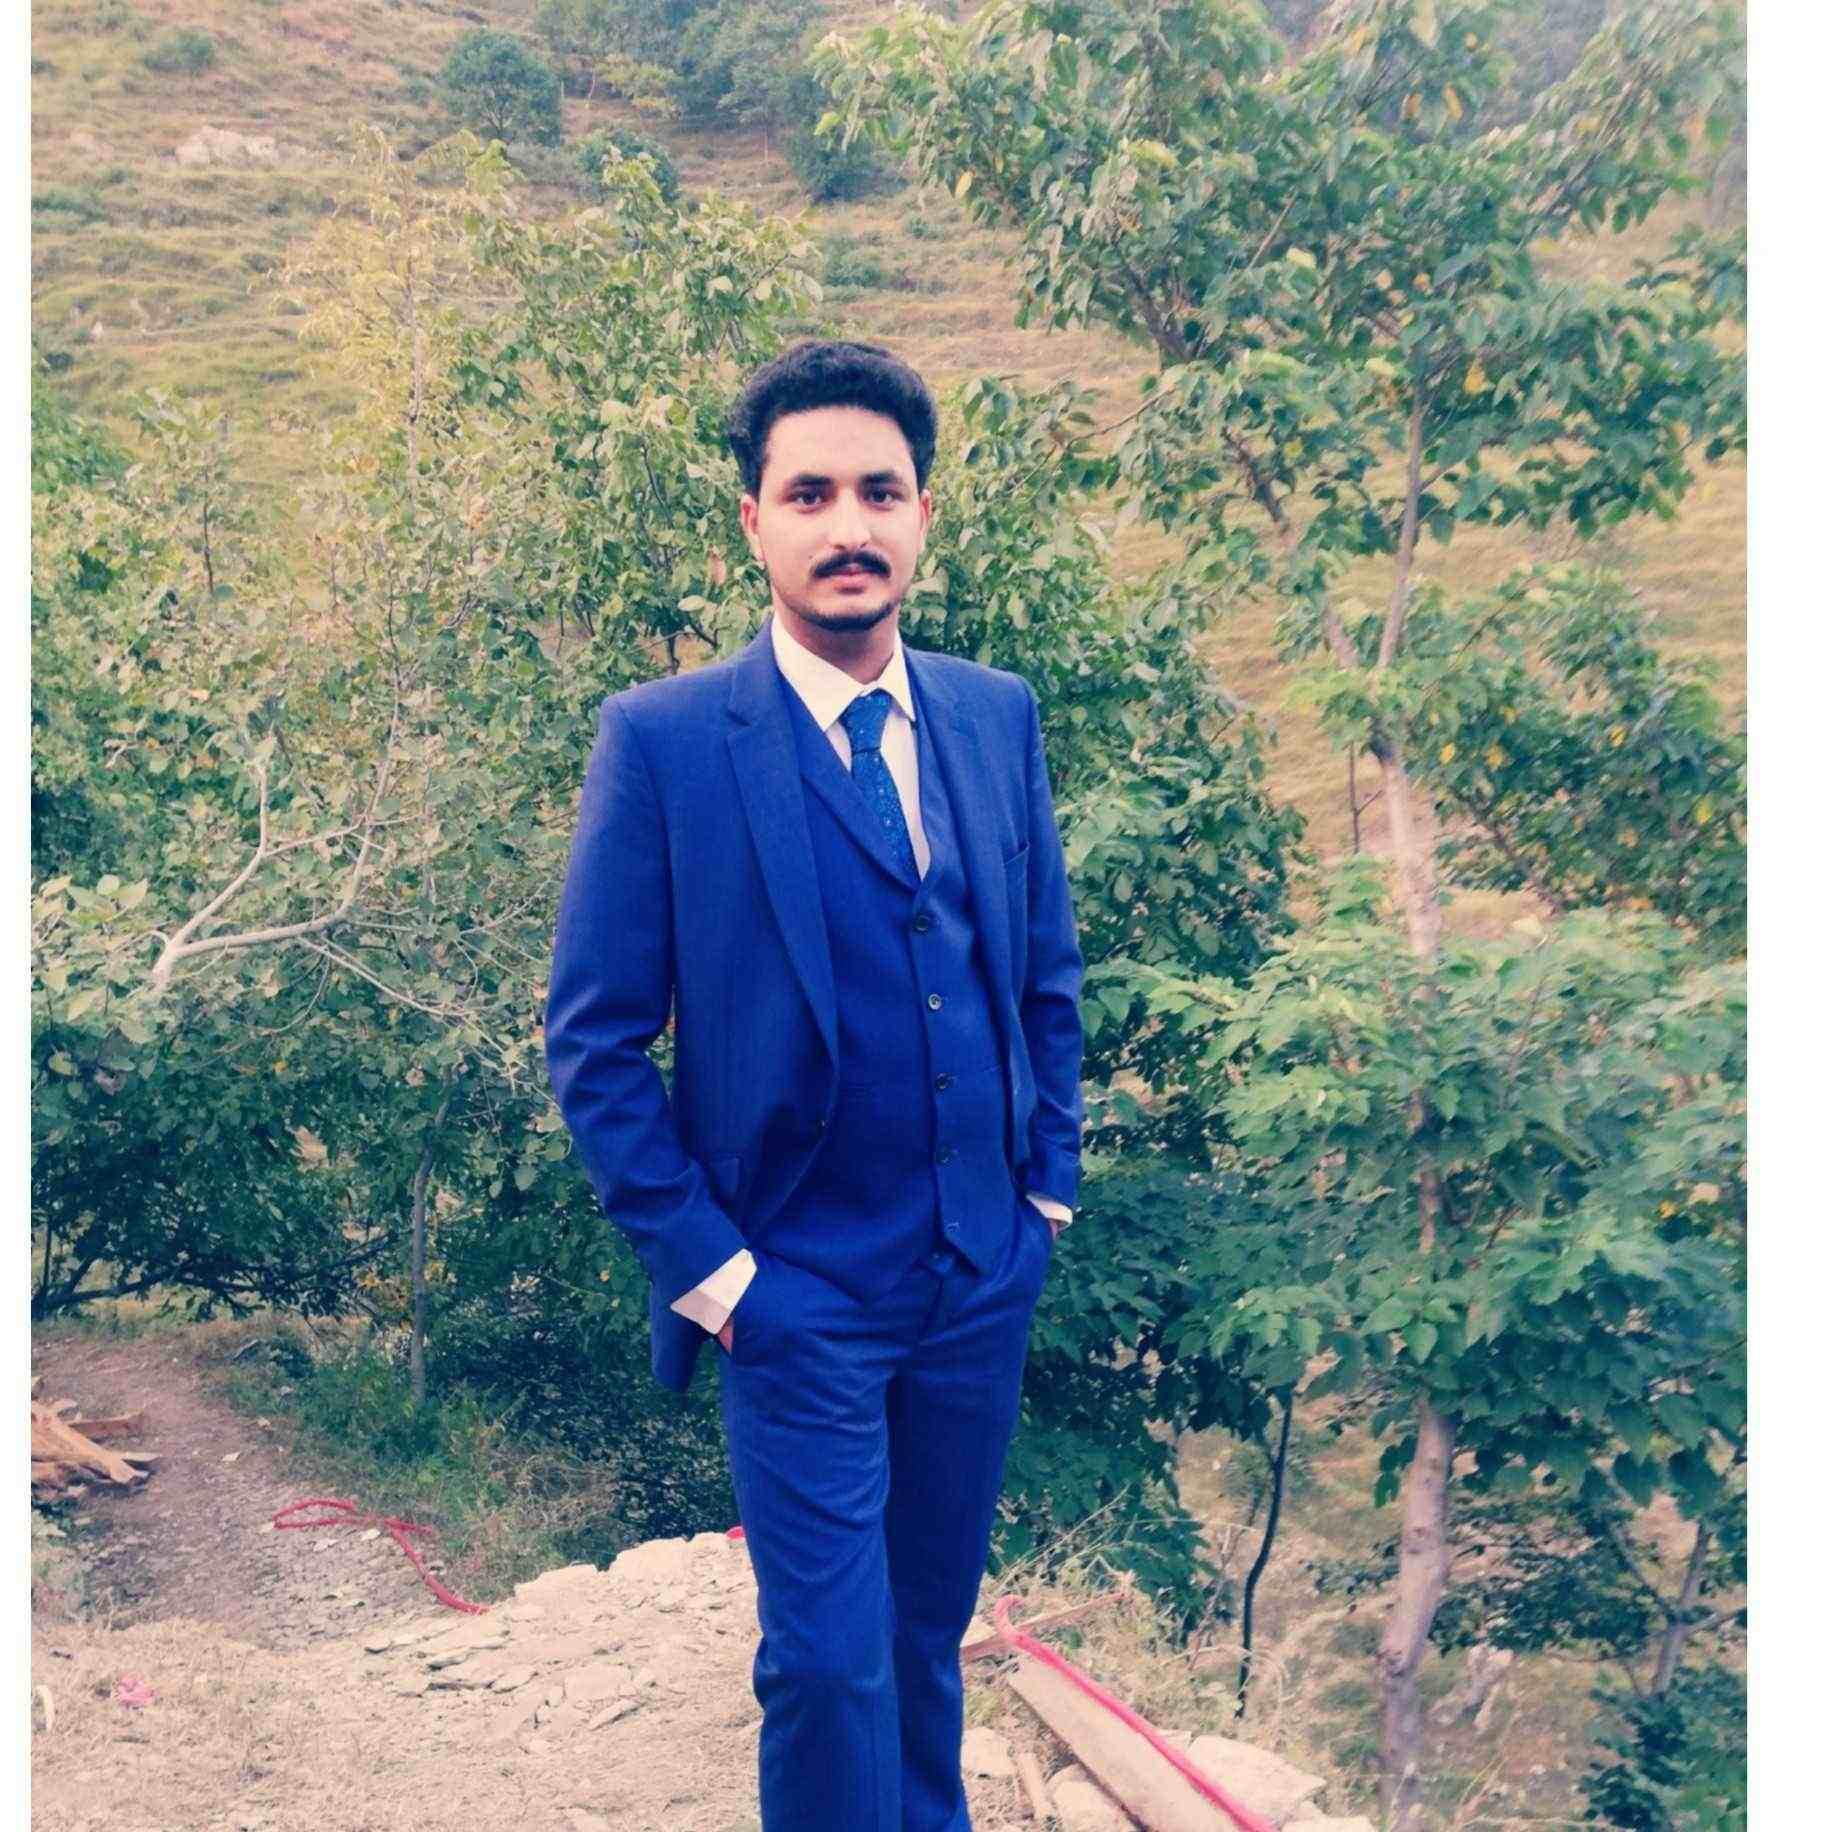 Mavia Amjad Abbasi